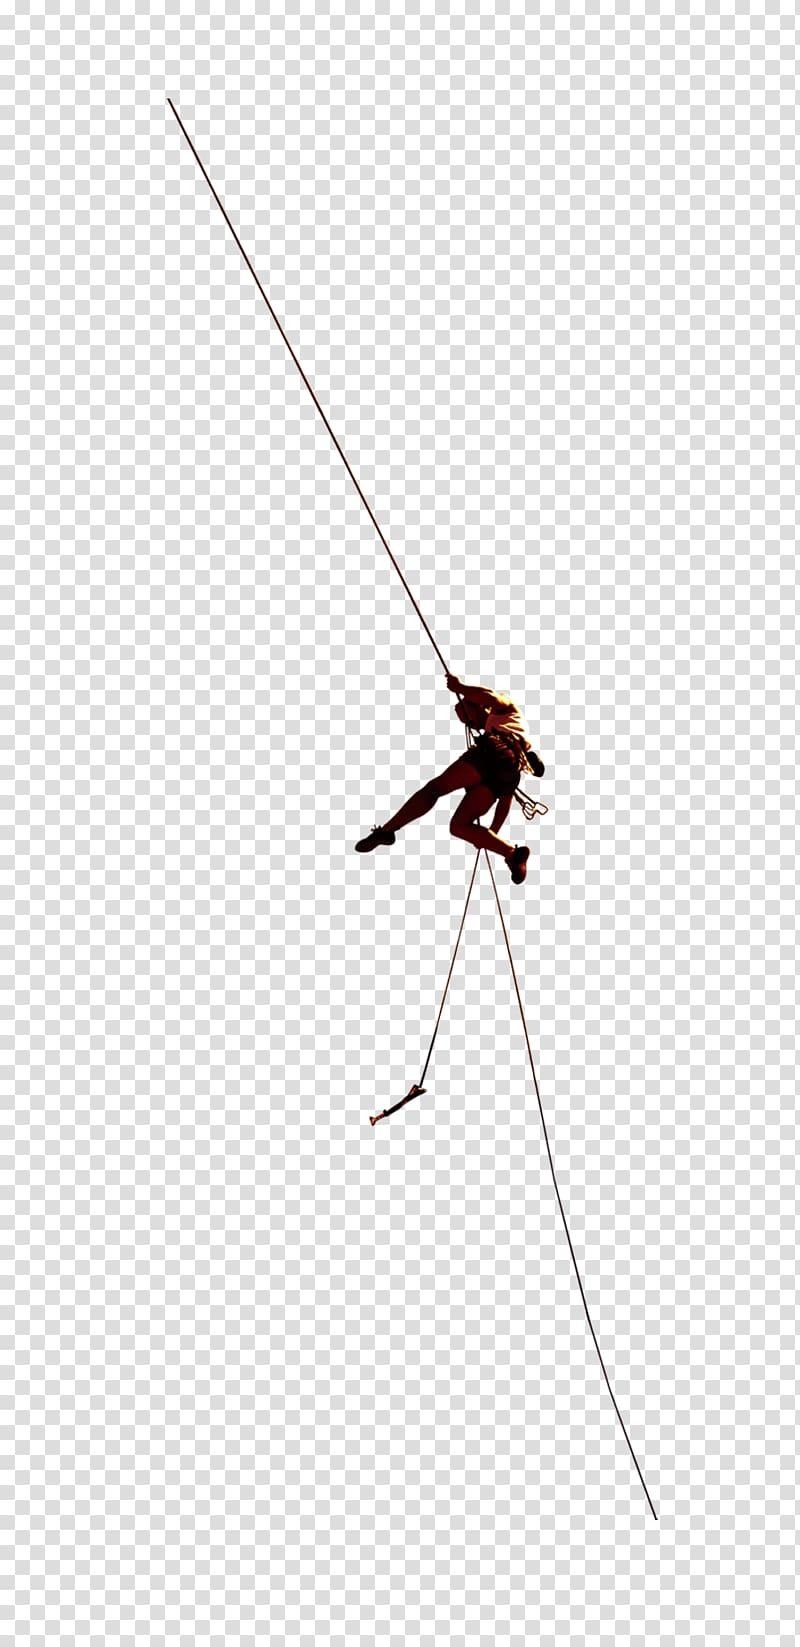 Rappelling clipart clip art transparent Man rappelling illustration, Rope climbing Rope climbing ... clip art transparent